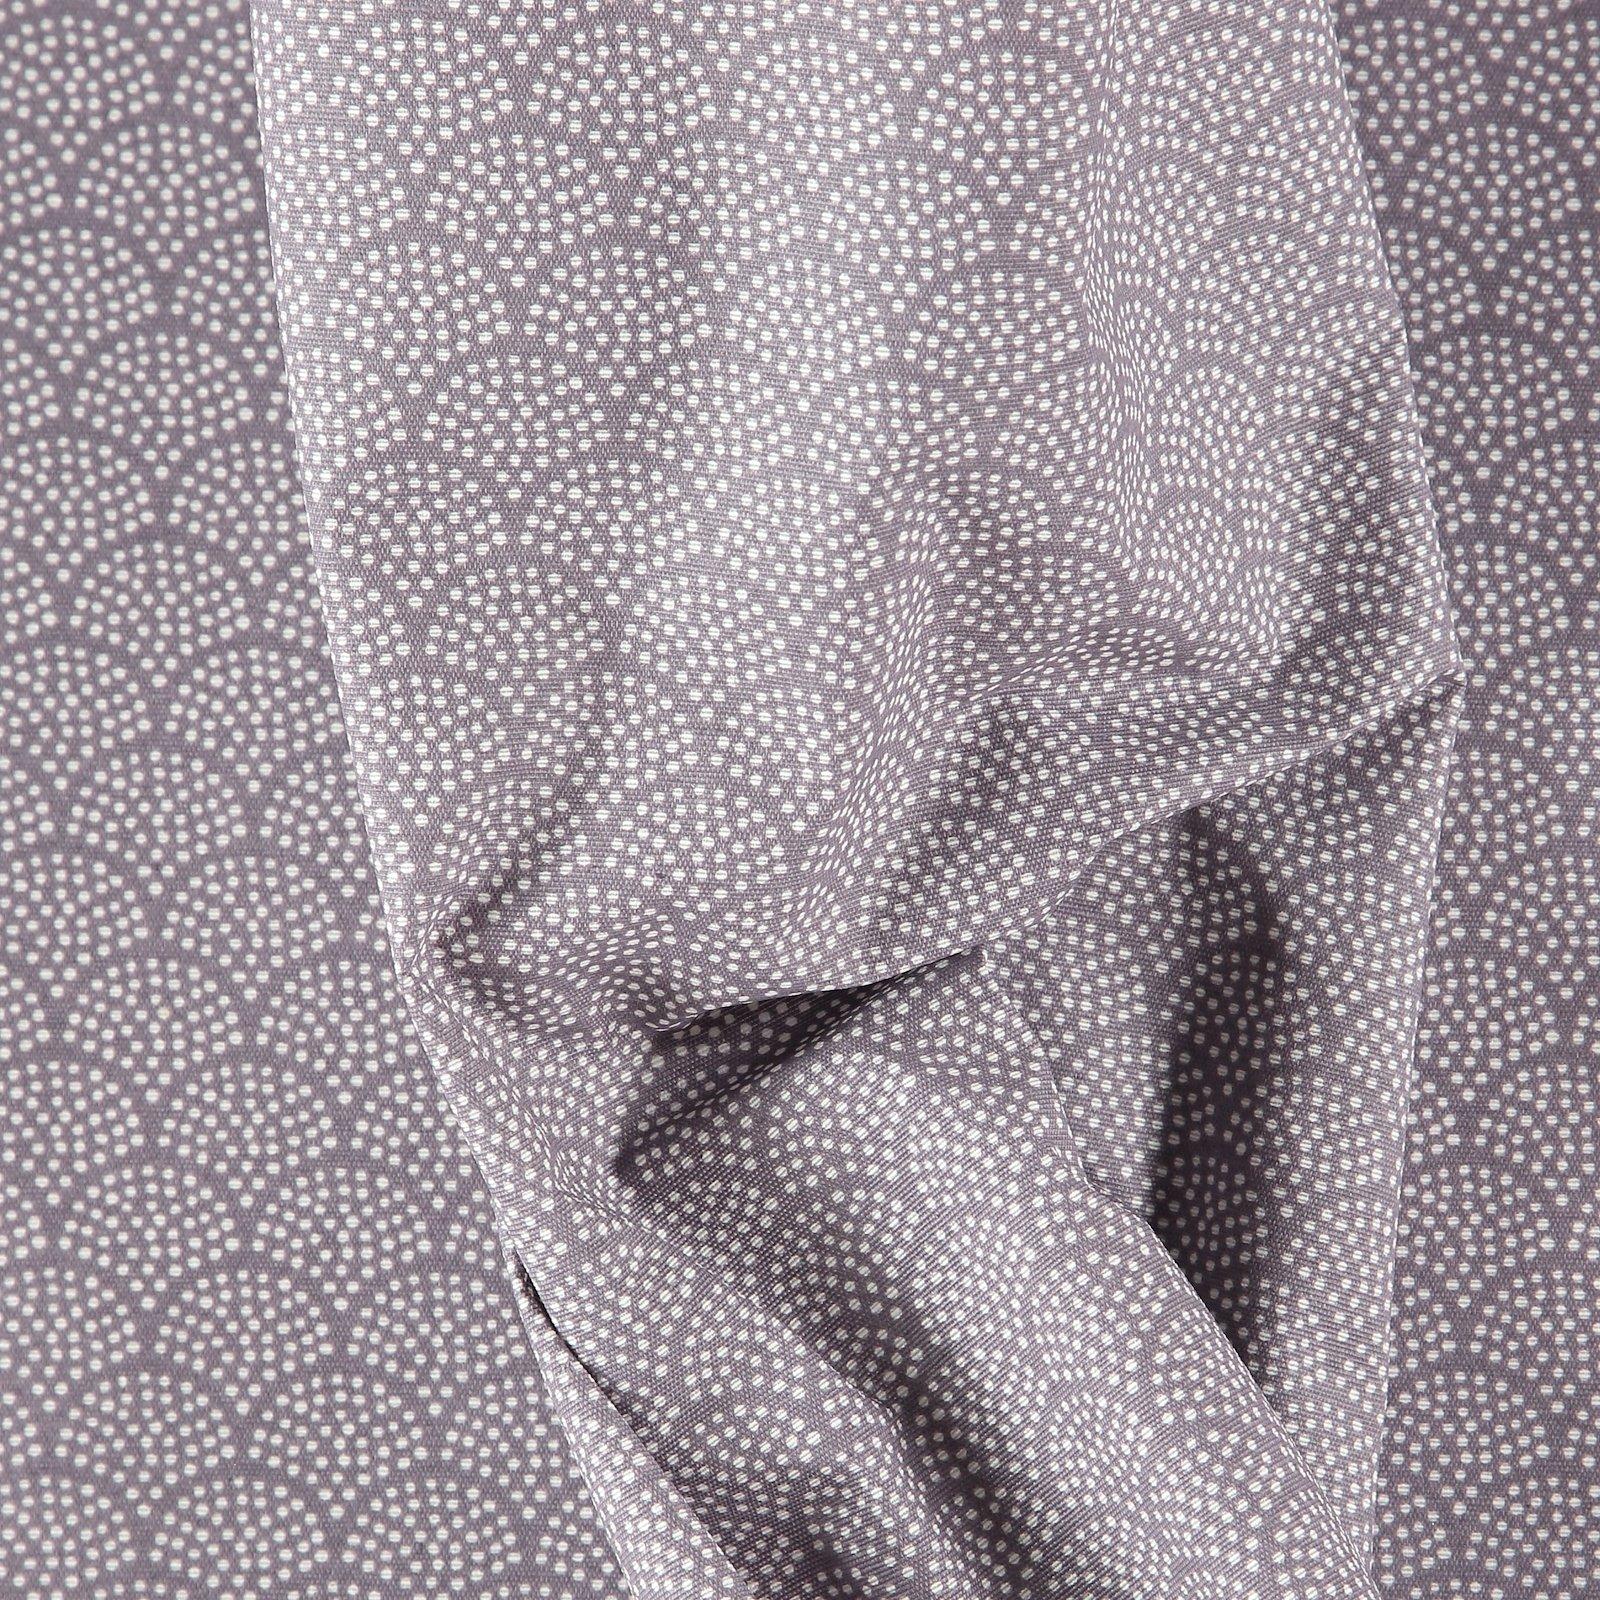 Woven oilcloth dusty purple/white arches